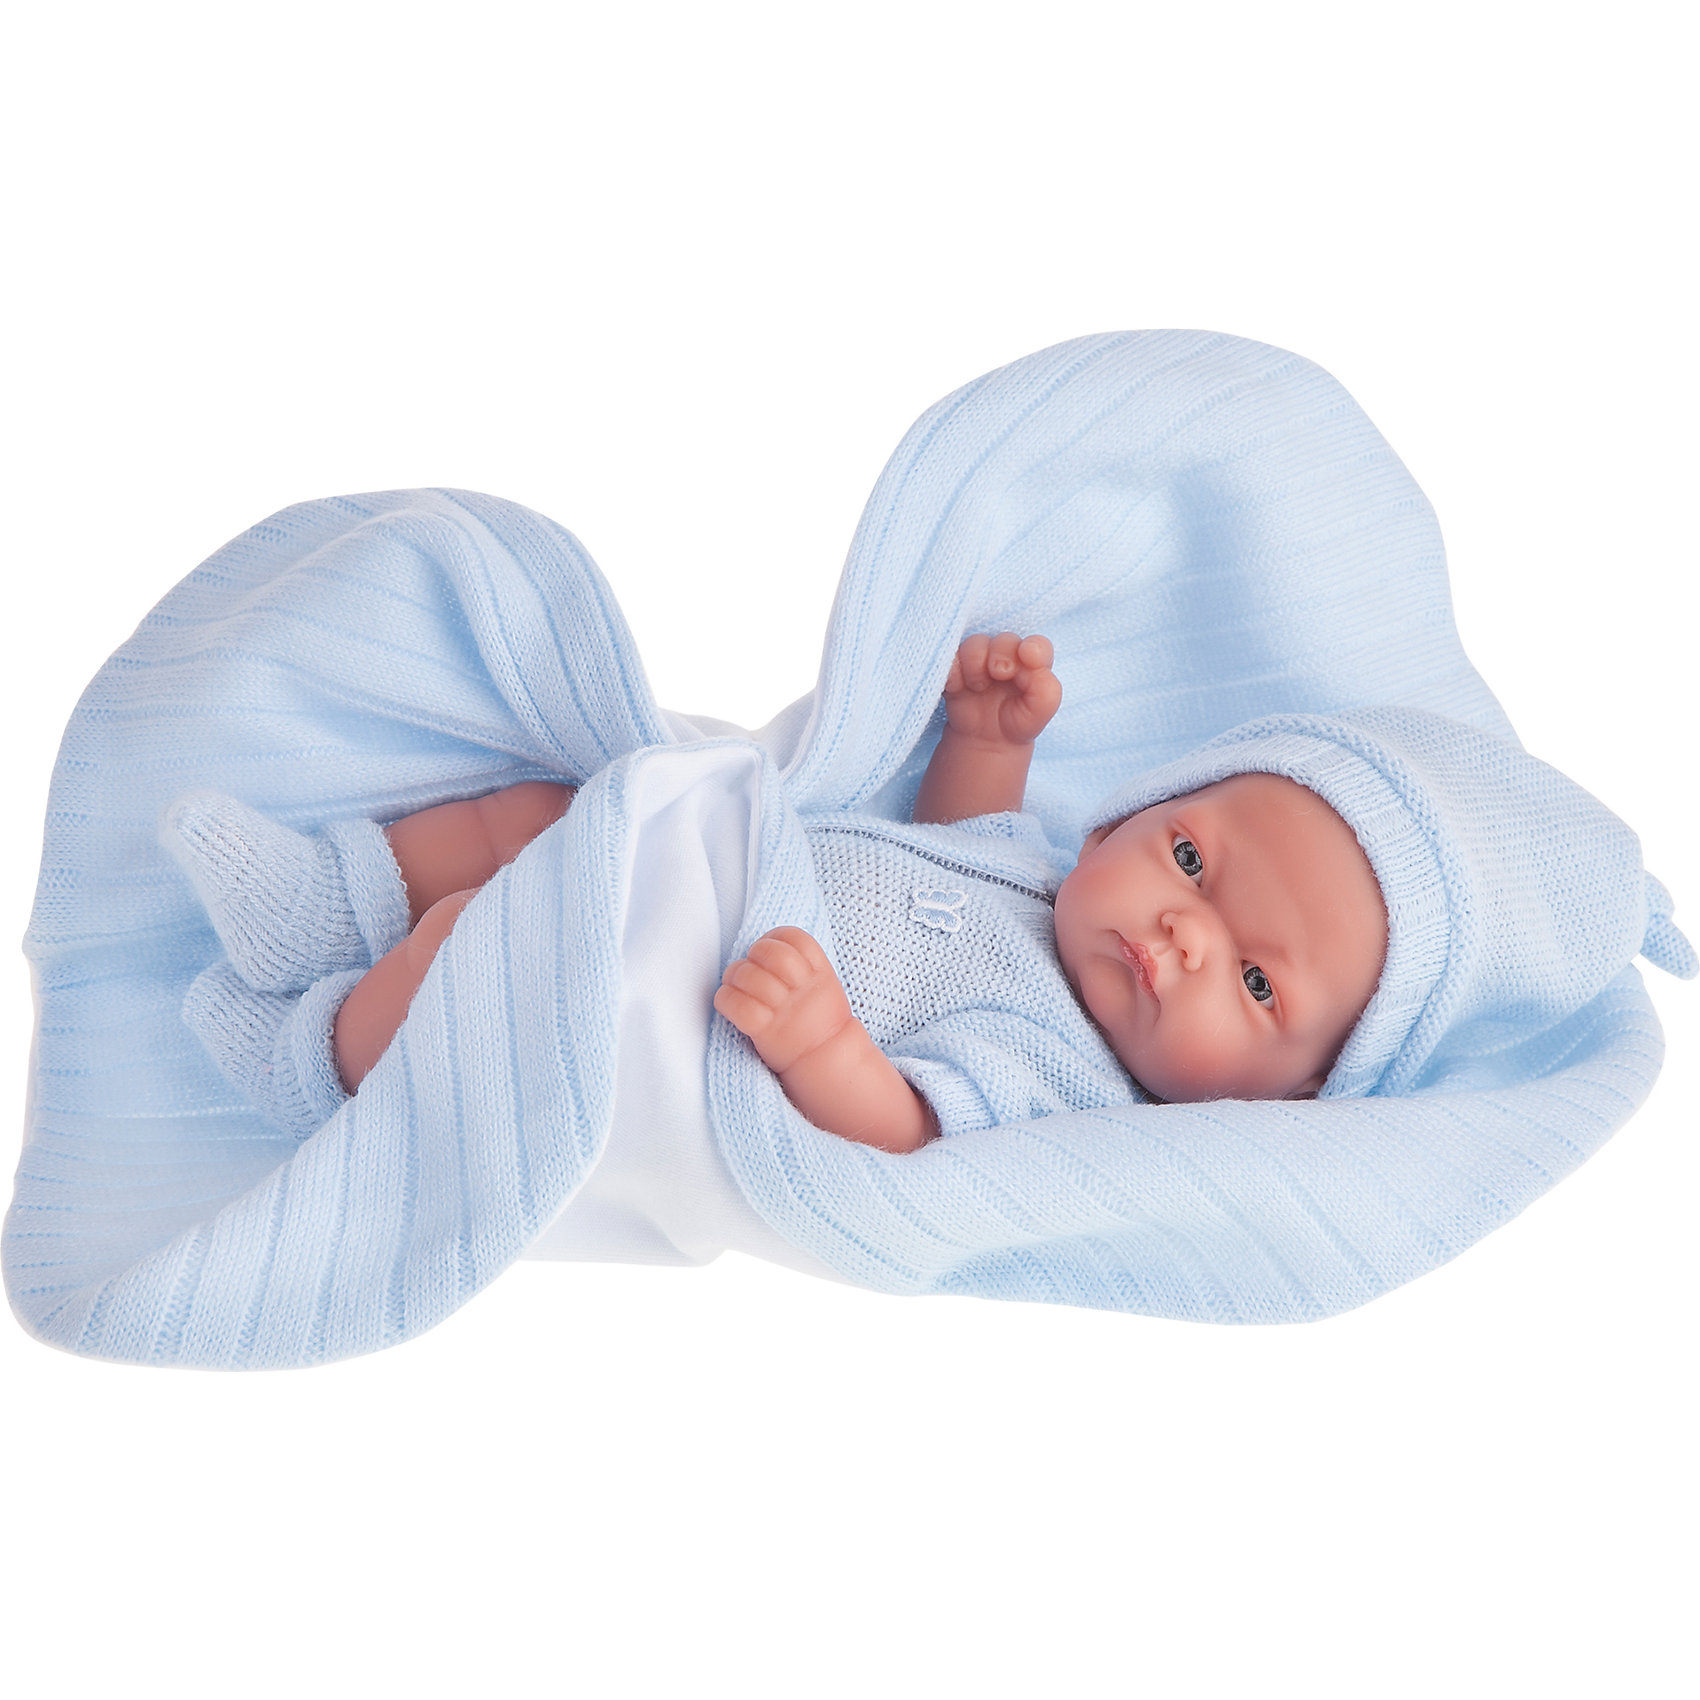 Munecas Antonio Juan Кукла-младенец Карлос в голубом одеяле, 26 см, Munecas Antonio Juan кукла младенец леон в голубом 26 см antonio juan munecas